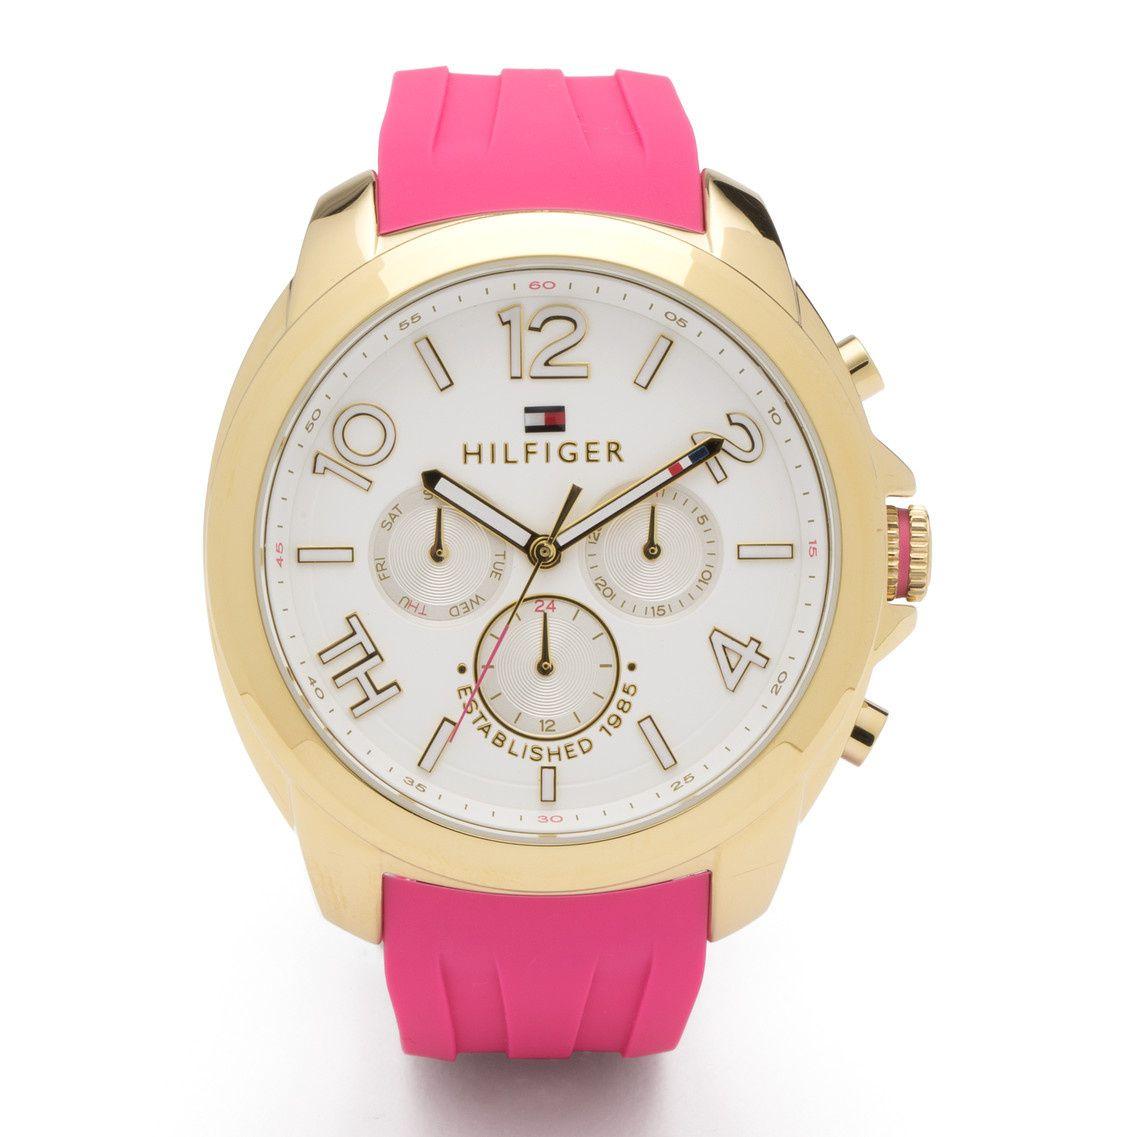 a9af3f3b7 Tommy Hilfiger Serena Reloj - Tienda oficial online Tommy Hilfiger ...